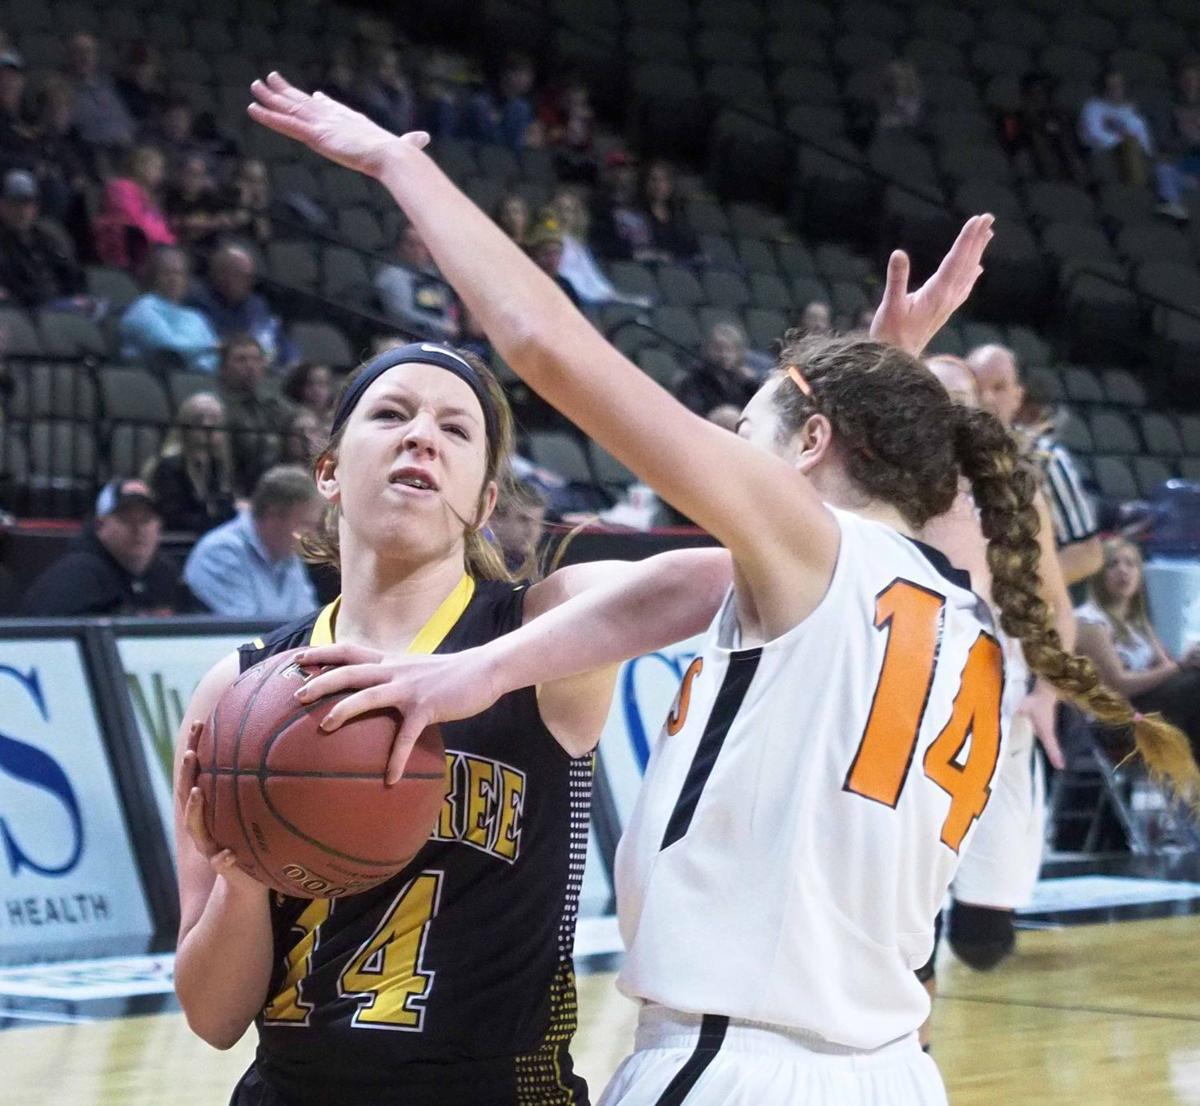 Cherokee vs Sergeant Bluff-Luton CNOS Foundation Basketball Classic